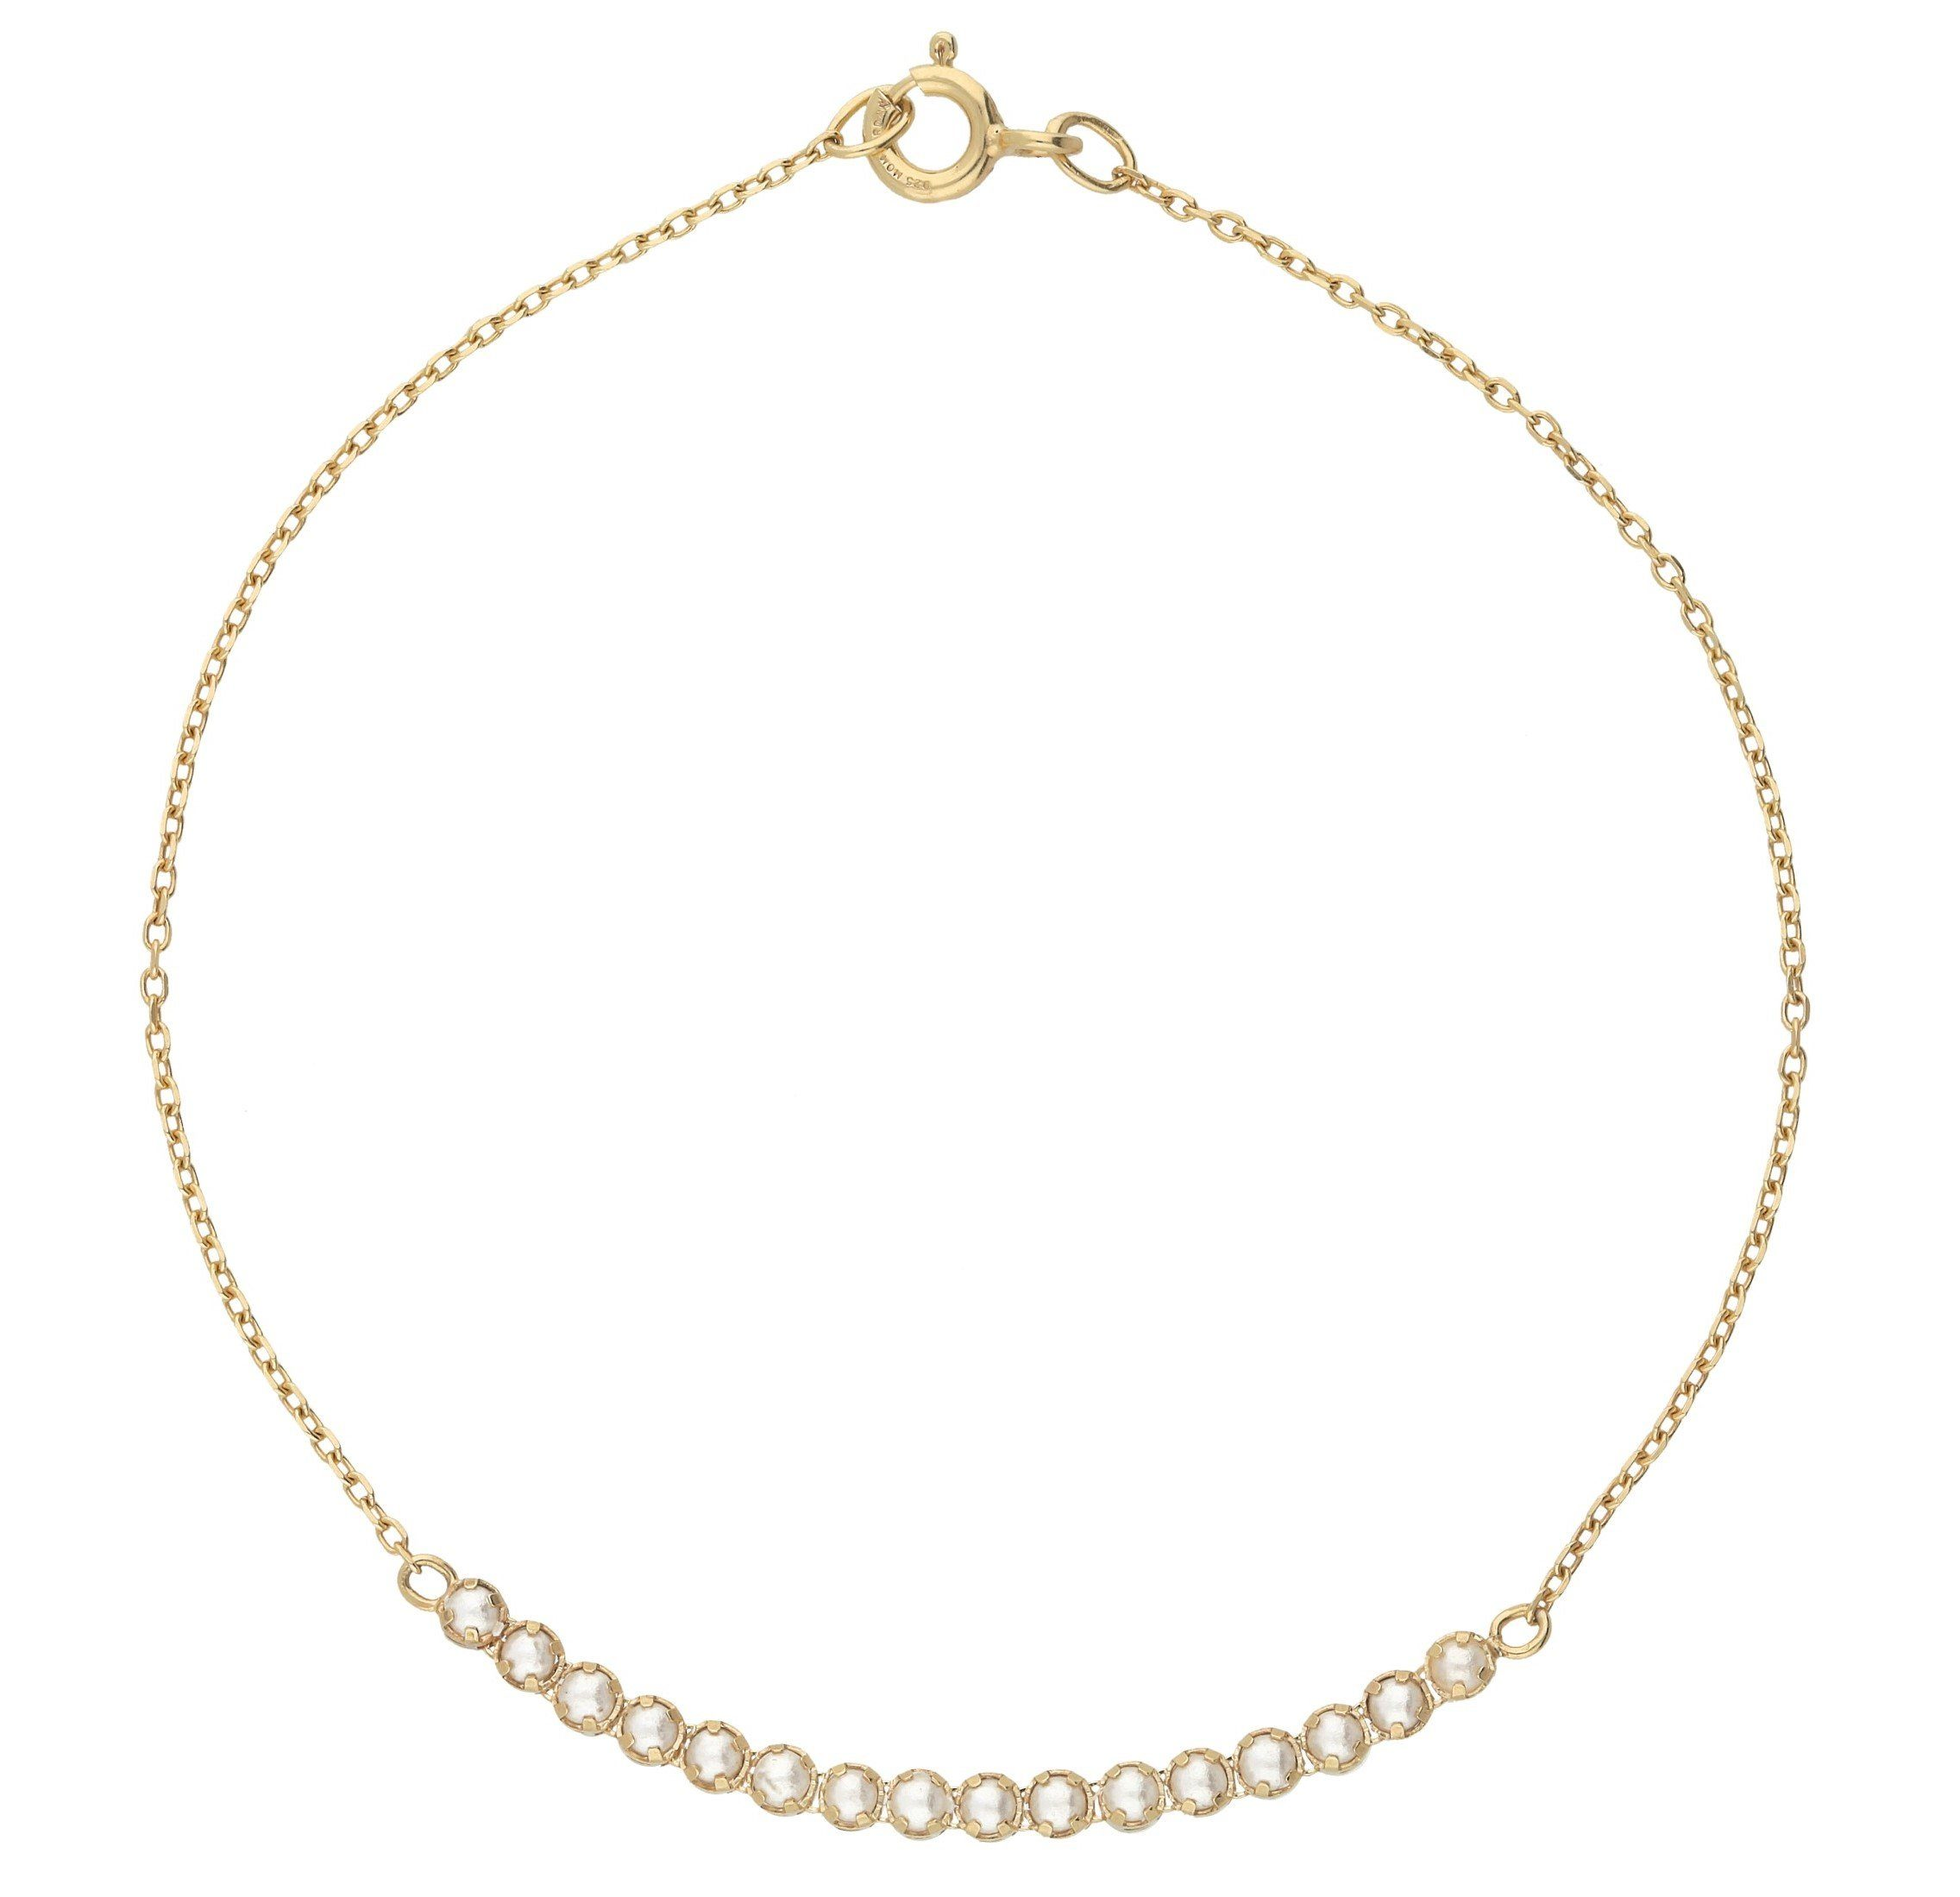 Vivance Armband Bridge-Tennisarmband Swarovski Perlen   Schmuck > Armbänder > Perlenarmbänder   Vivance